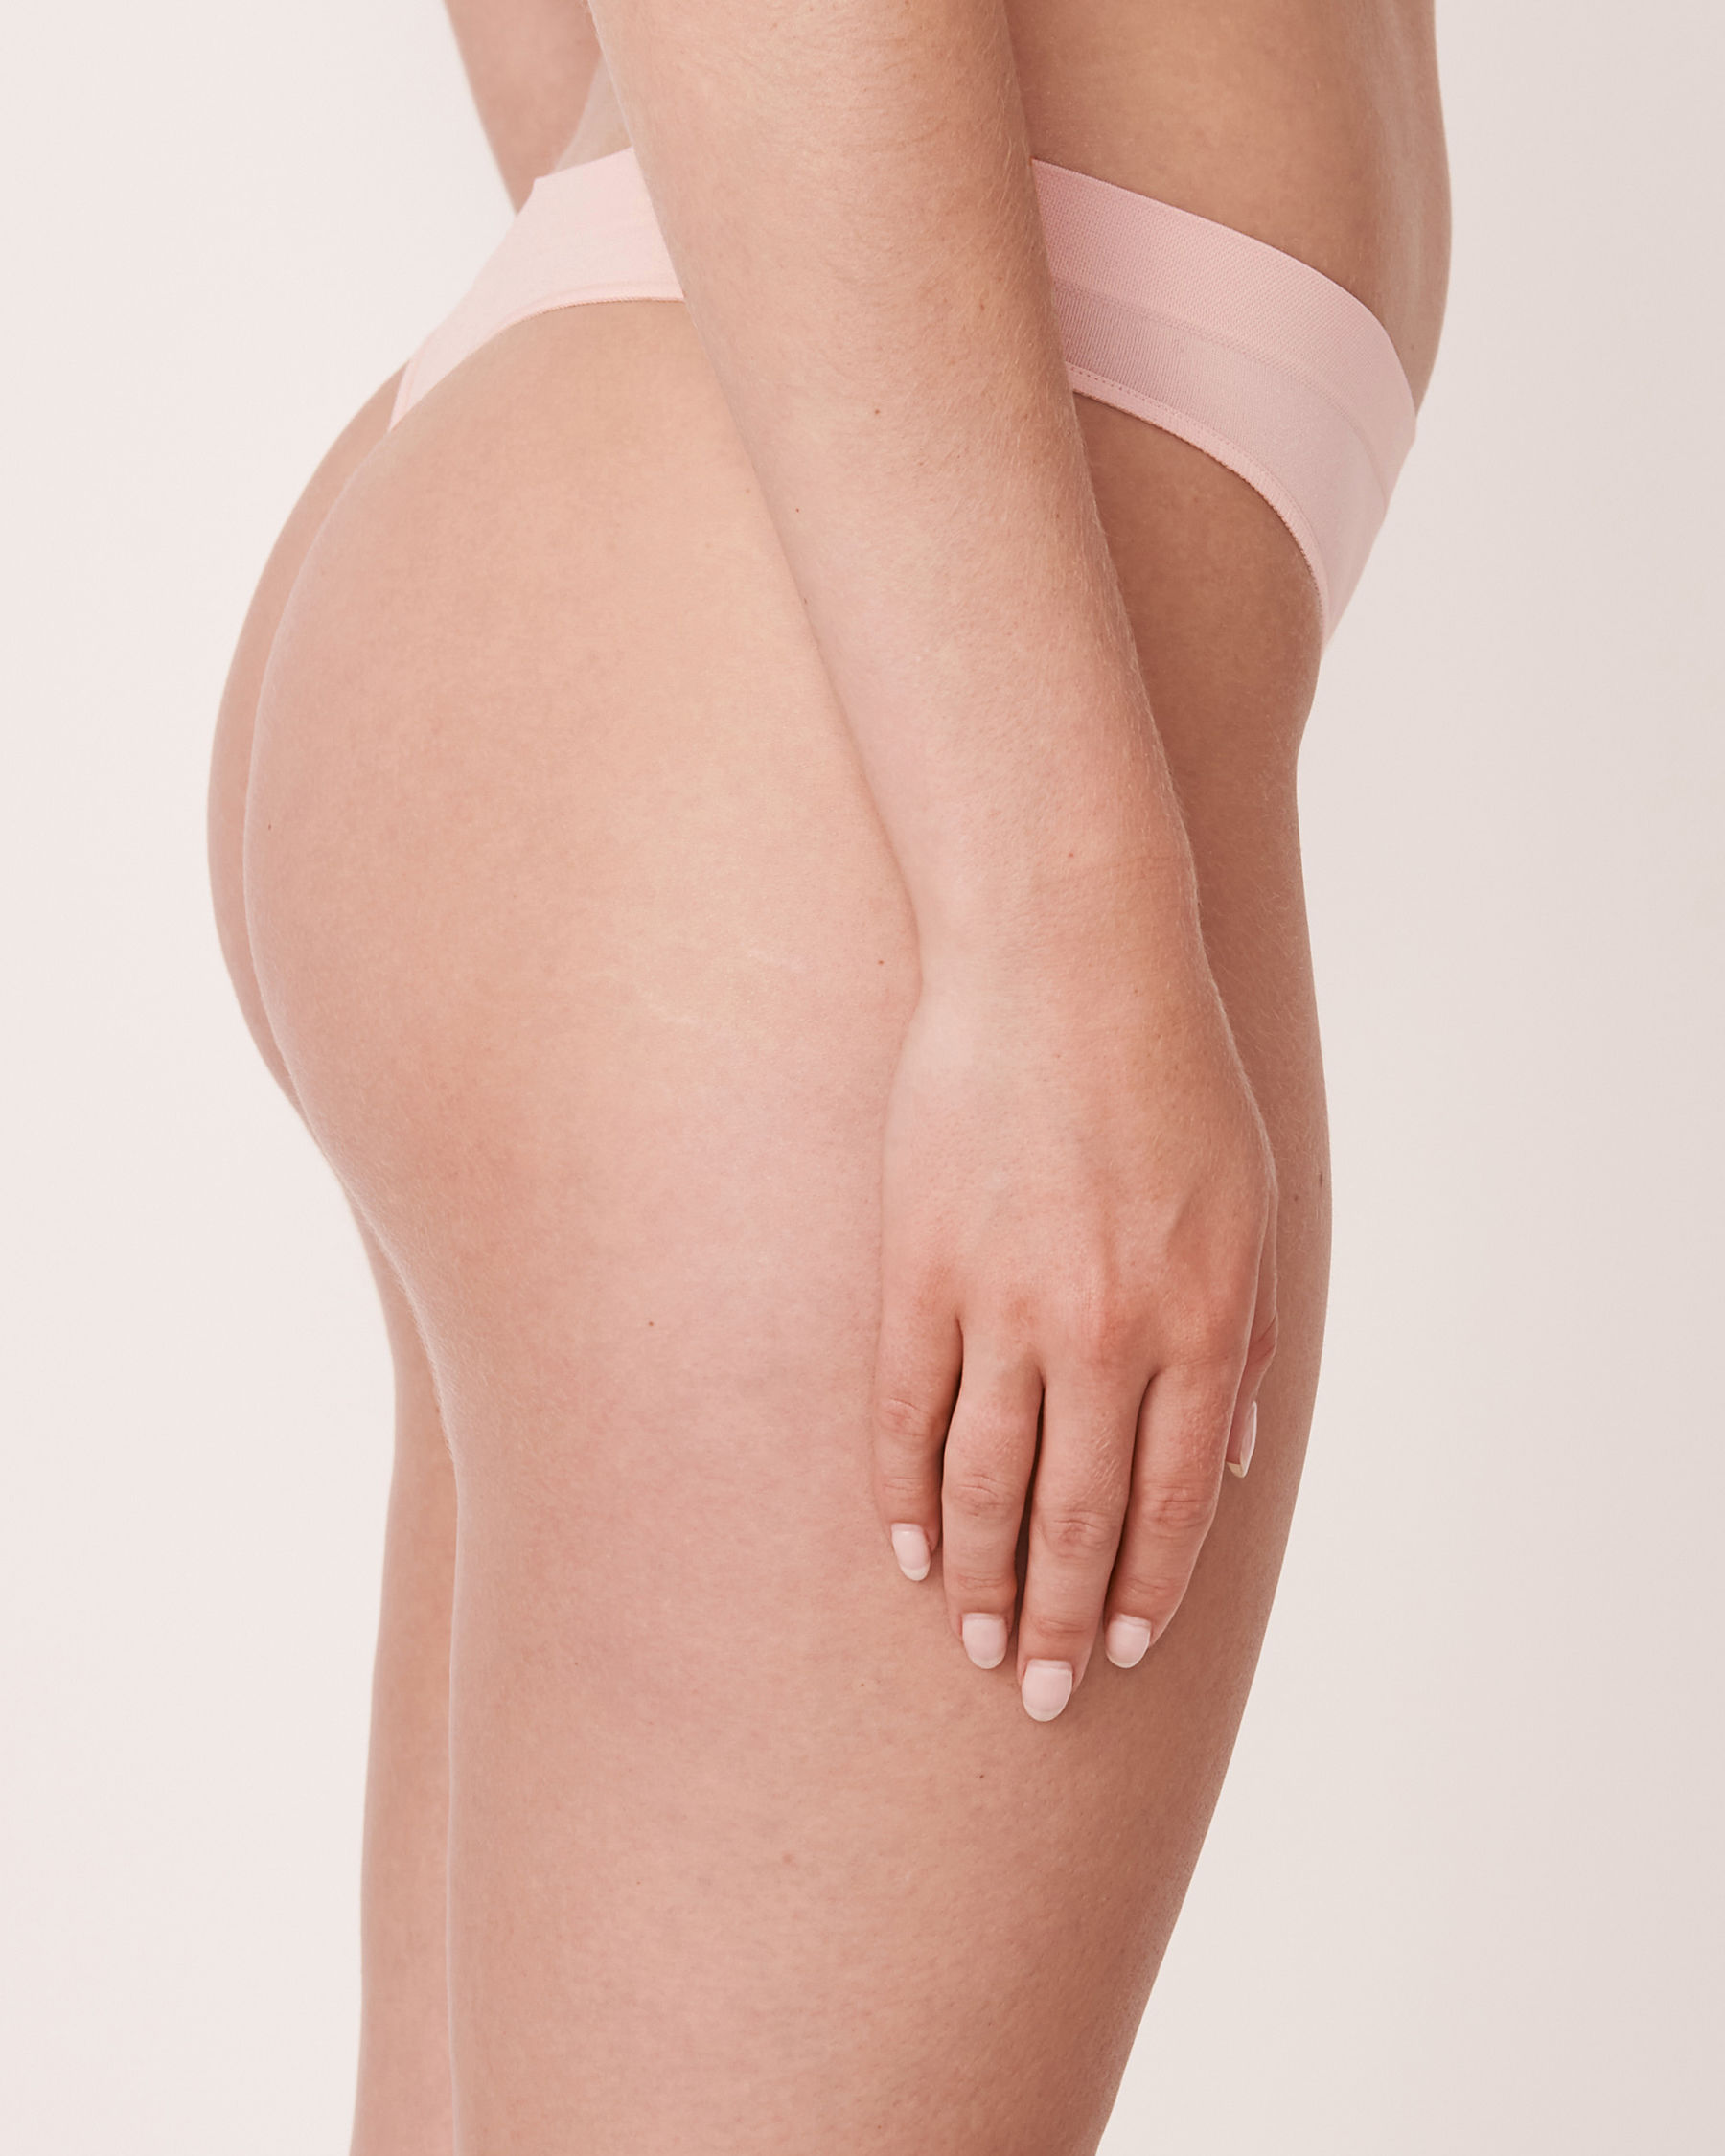 LA VIE EN ROSE Seamless Thong Panty Light pink 20200036 - View2